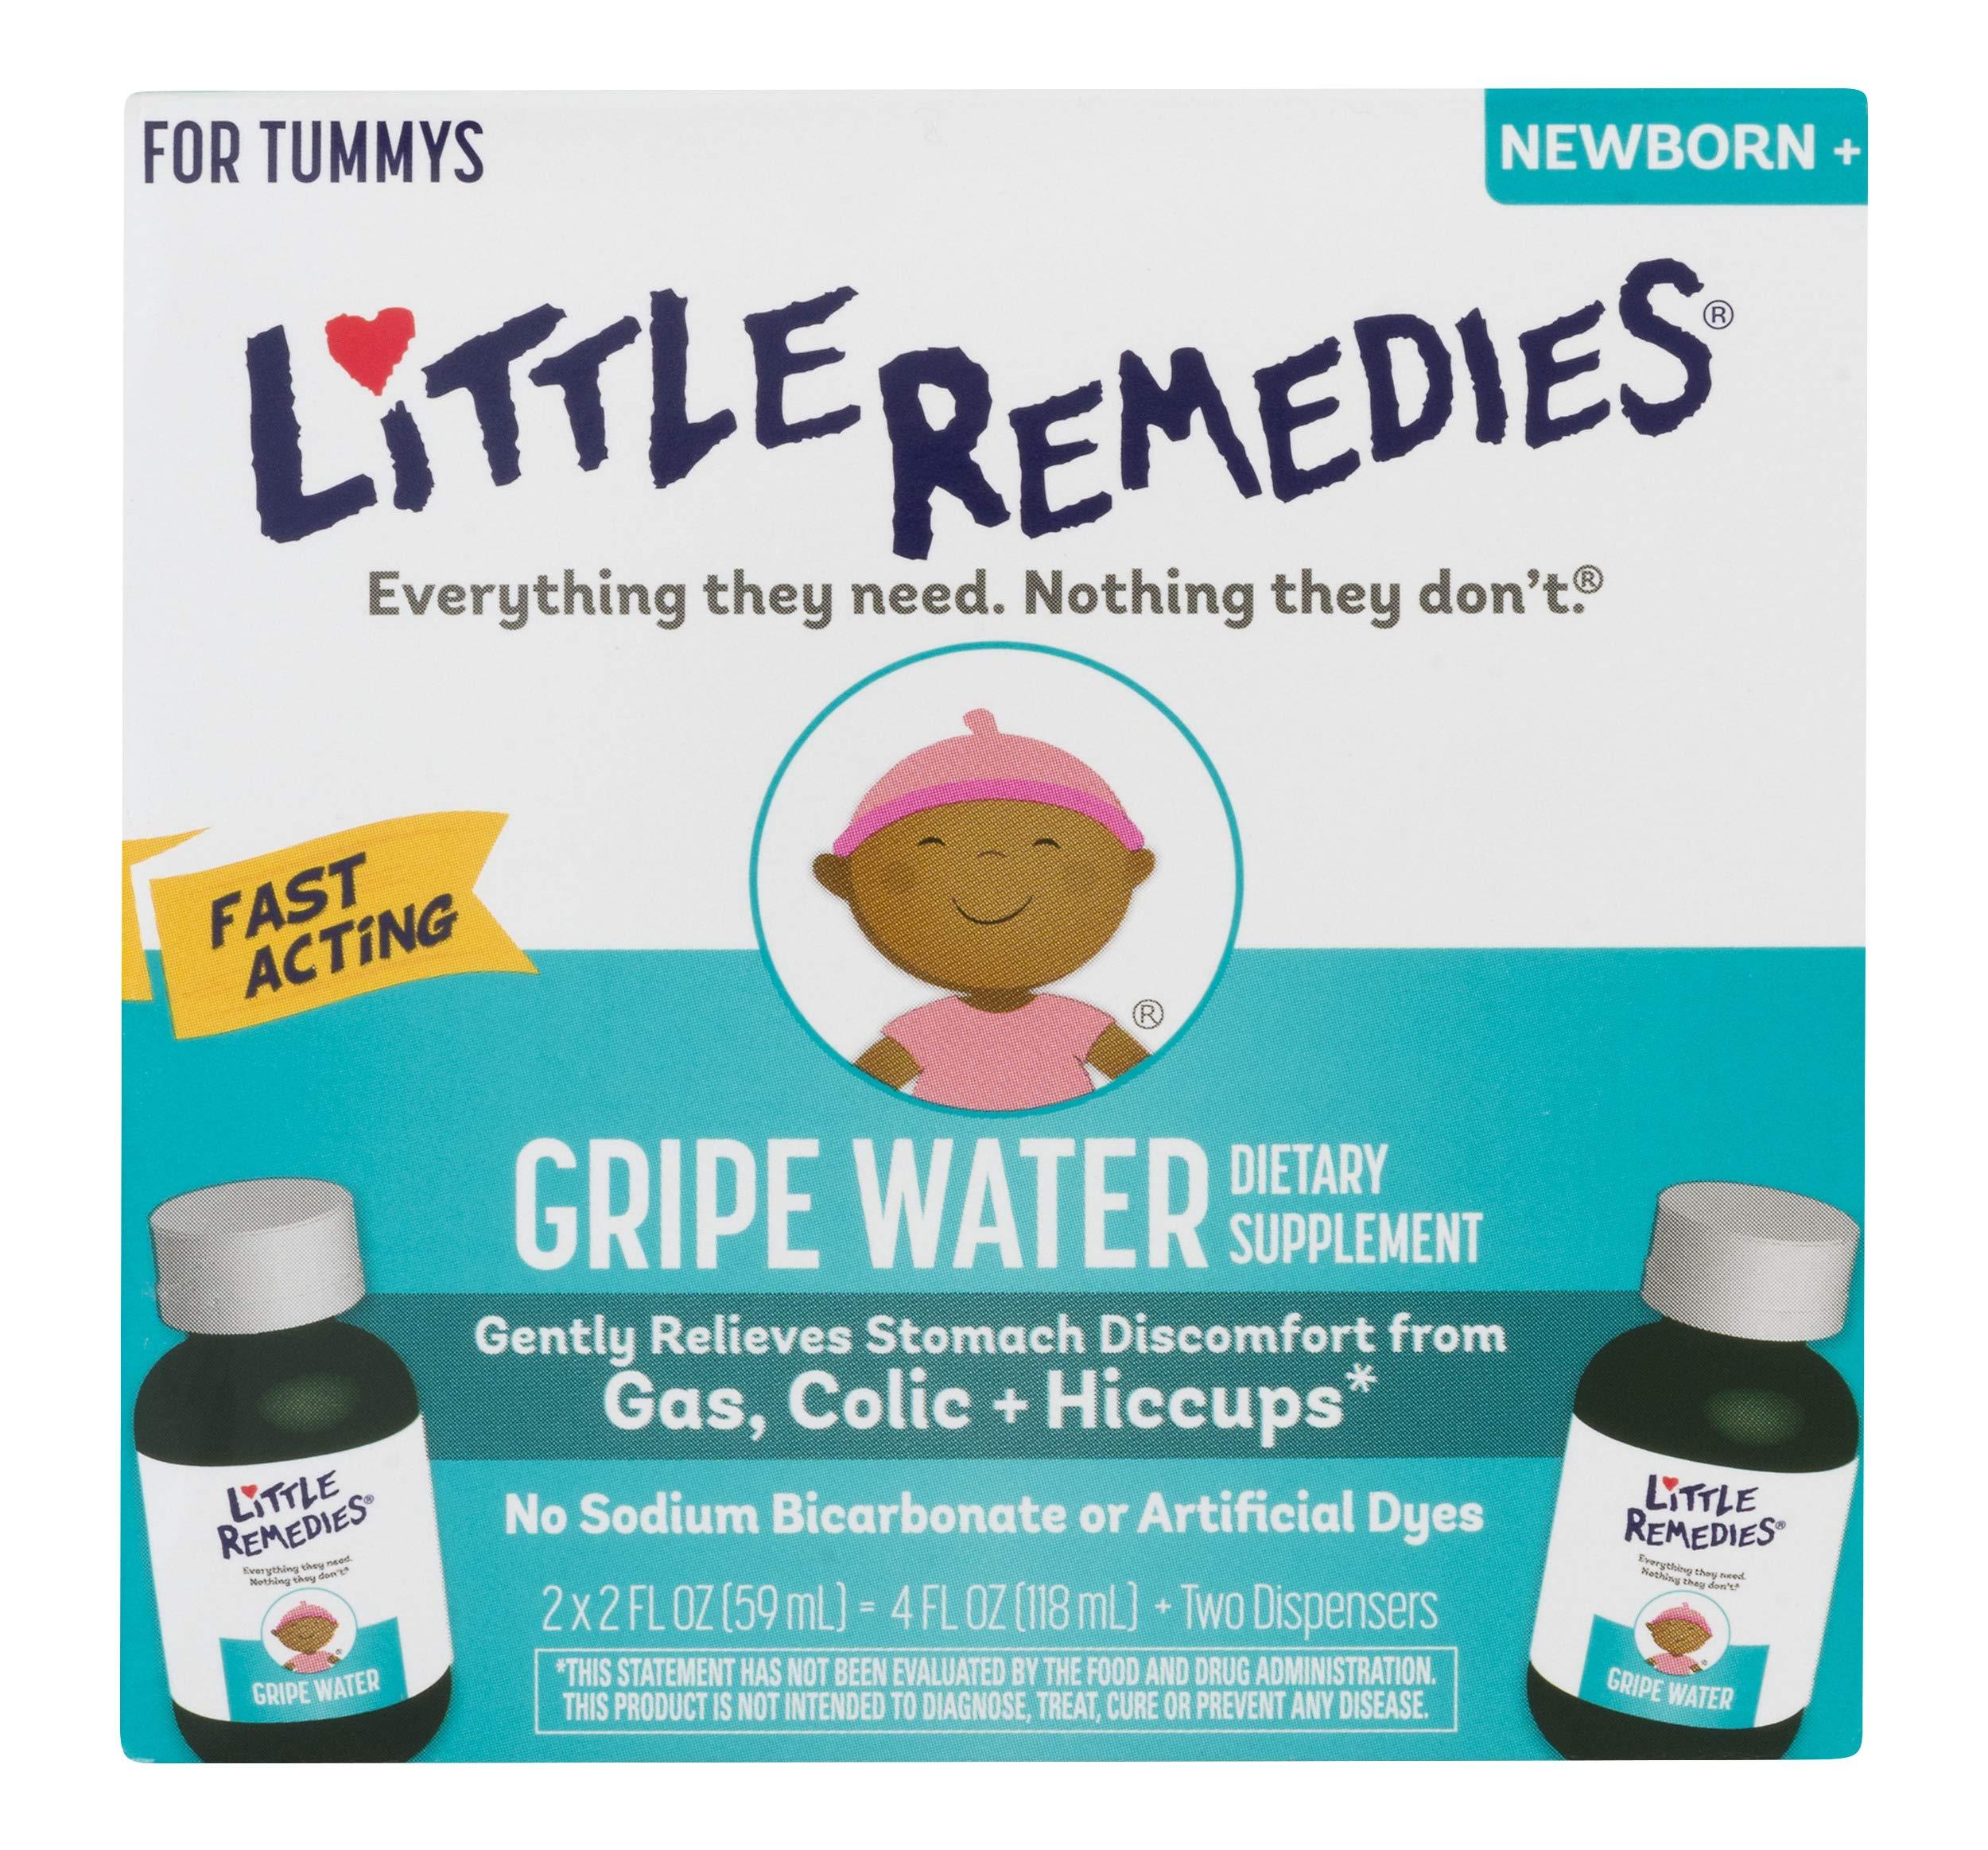 Little Remedies Gripe Water, Safe for Newborns, 2 Fl Oz, Pack of 2